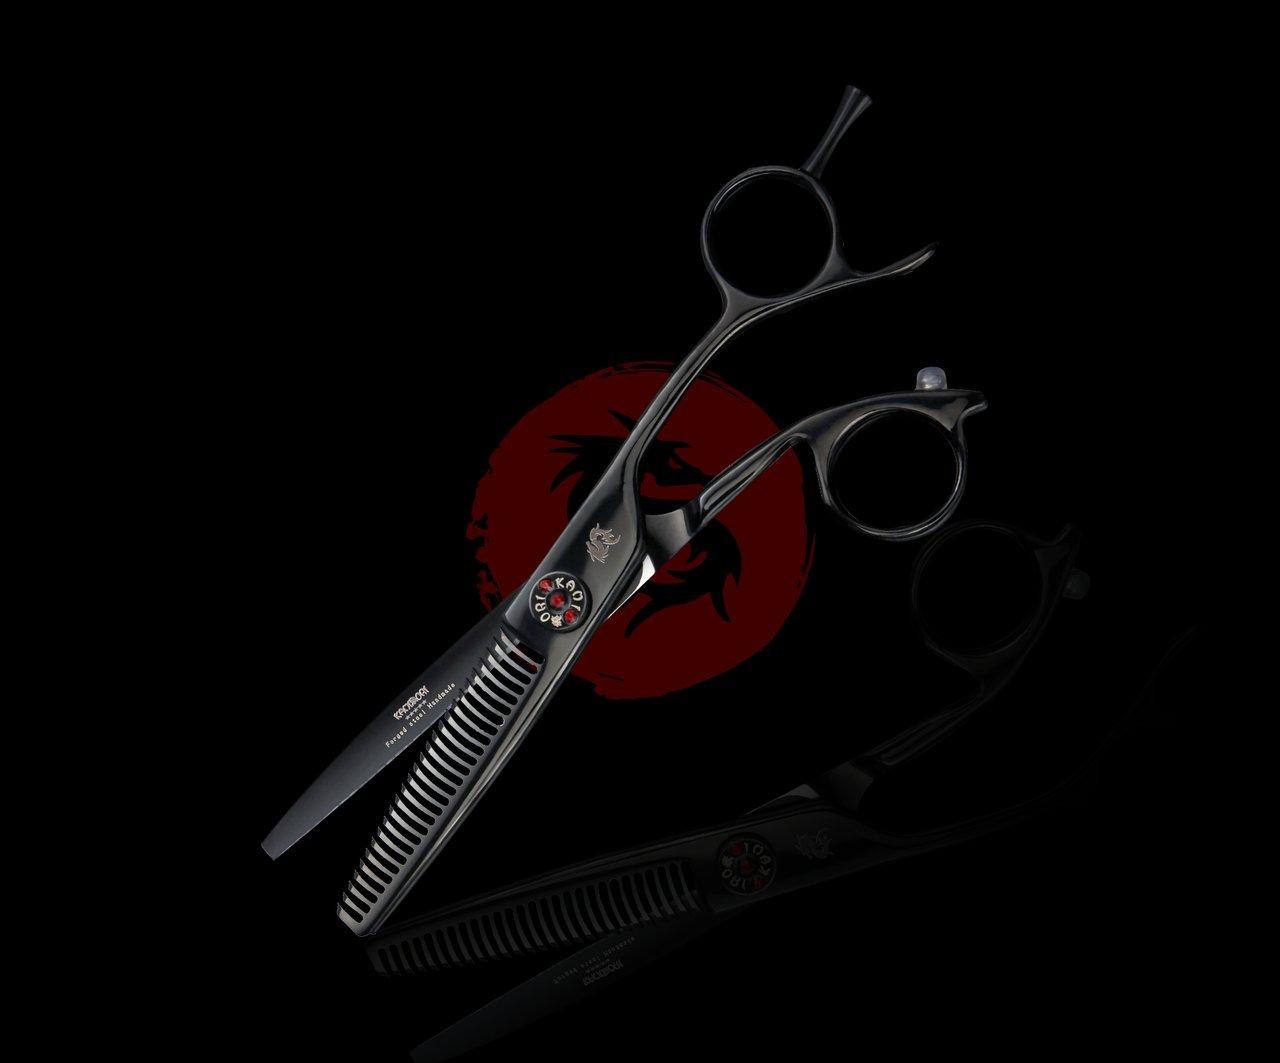 Kamisori Black Diamond 30 Tooth Texturizing / Thinning Shear / Scissor (57A8BA44) - Authorized Distributor